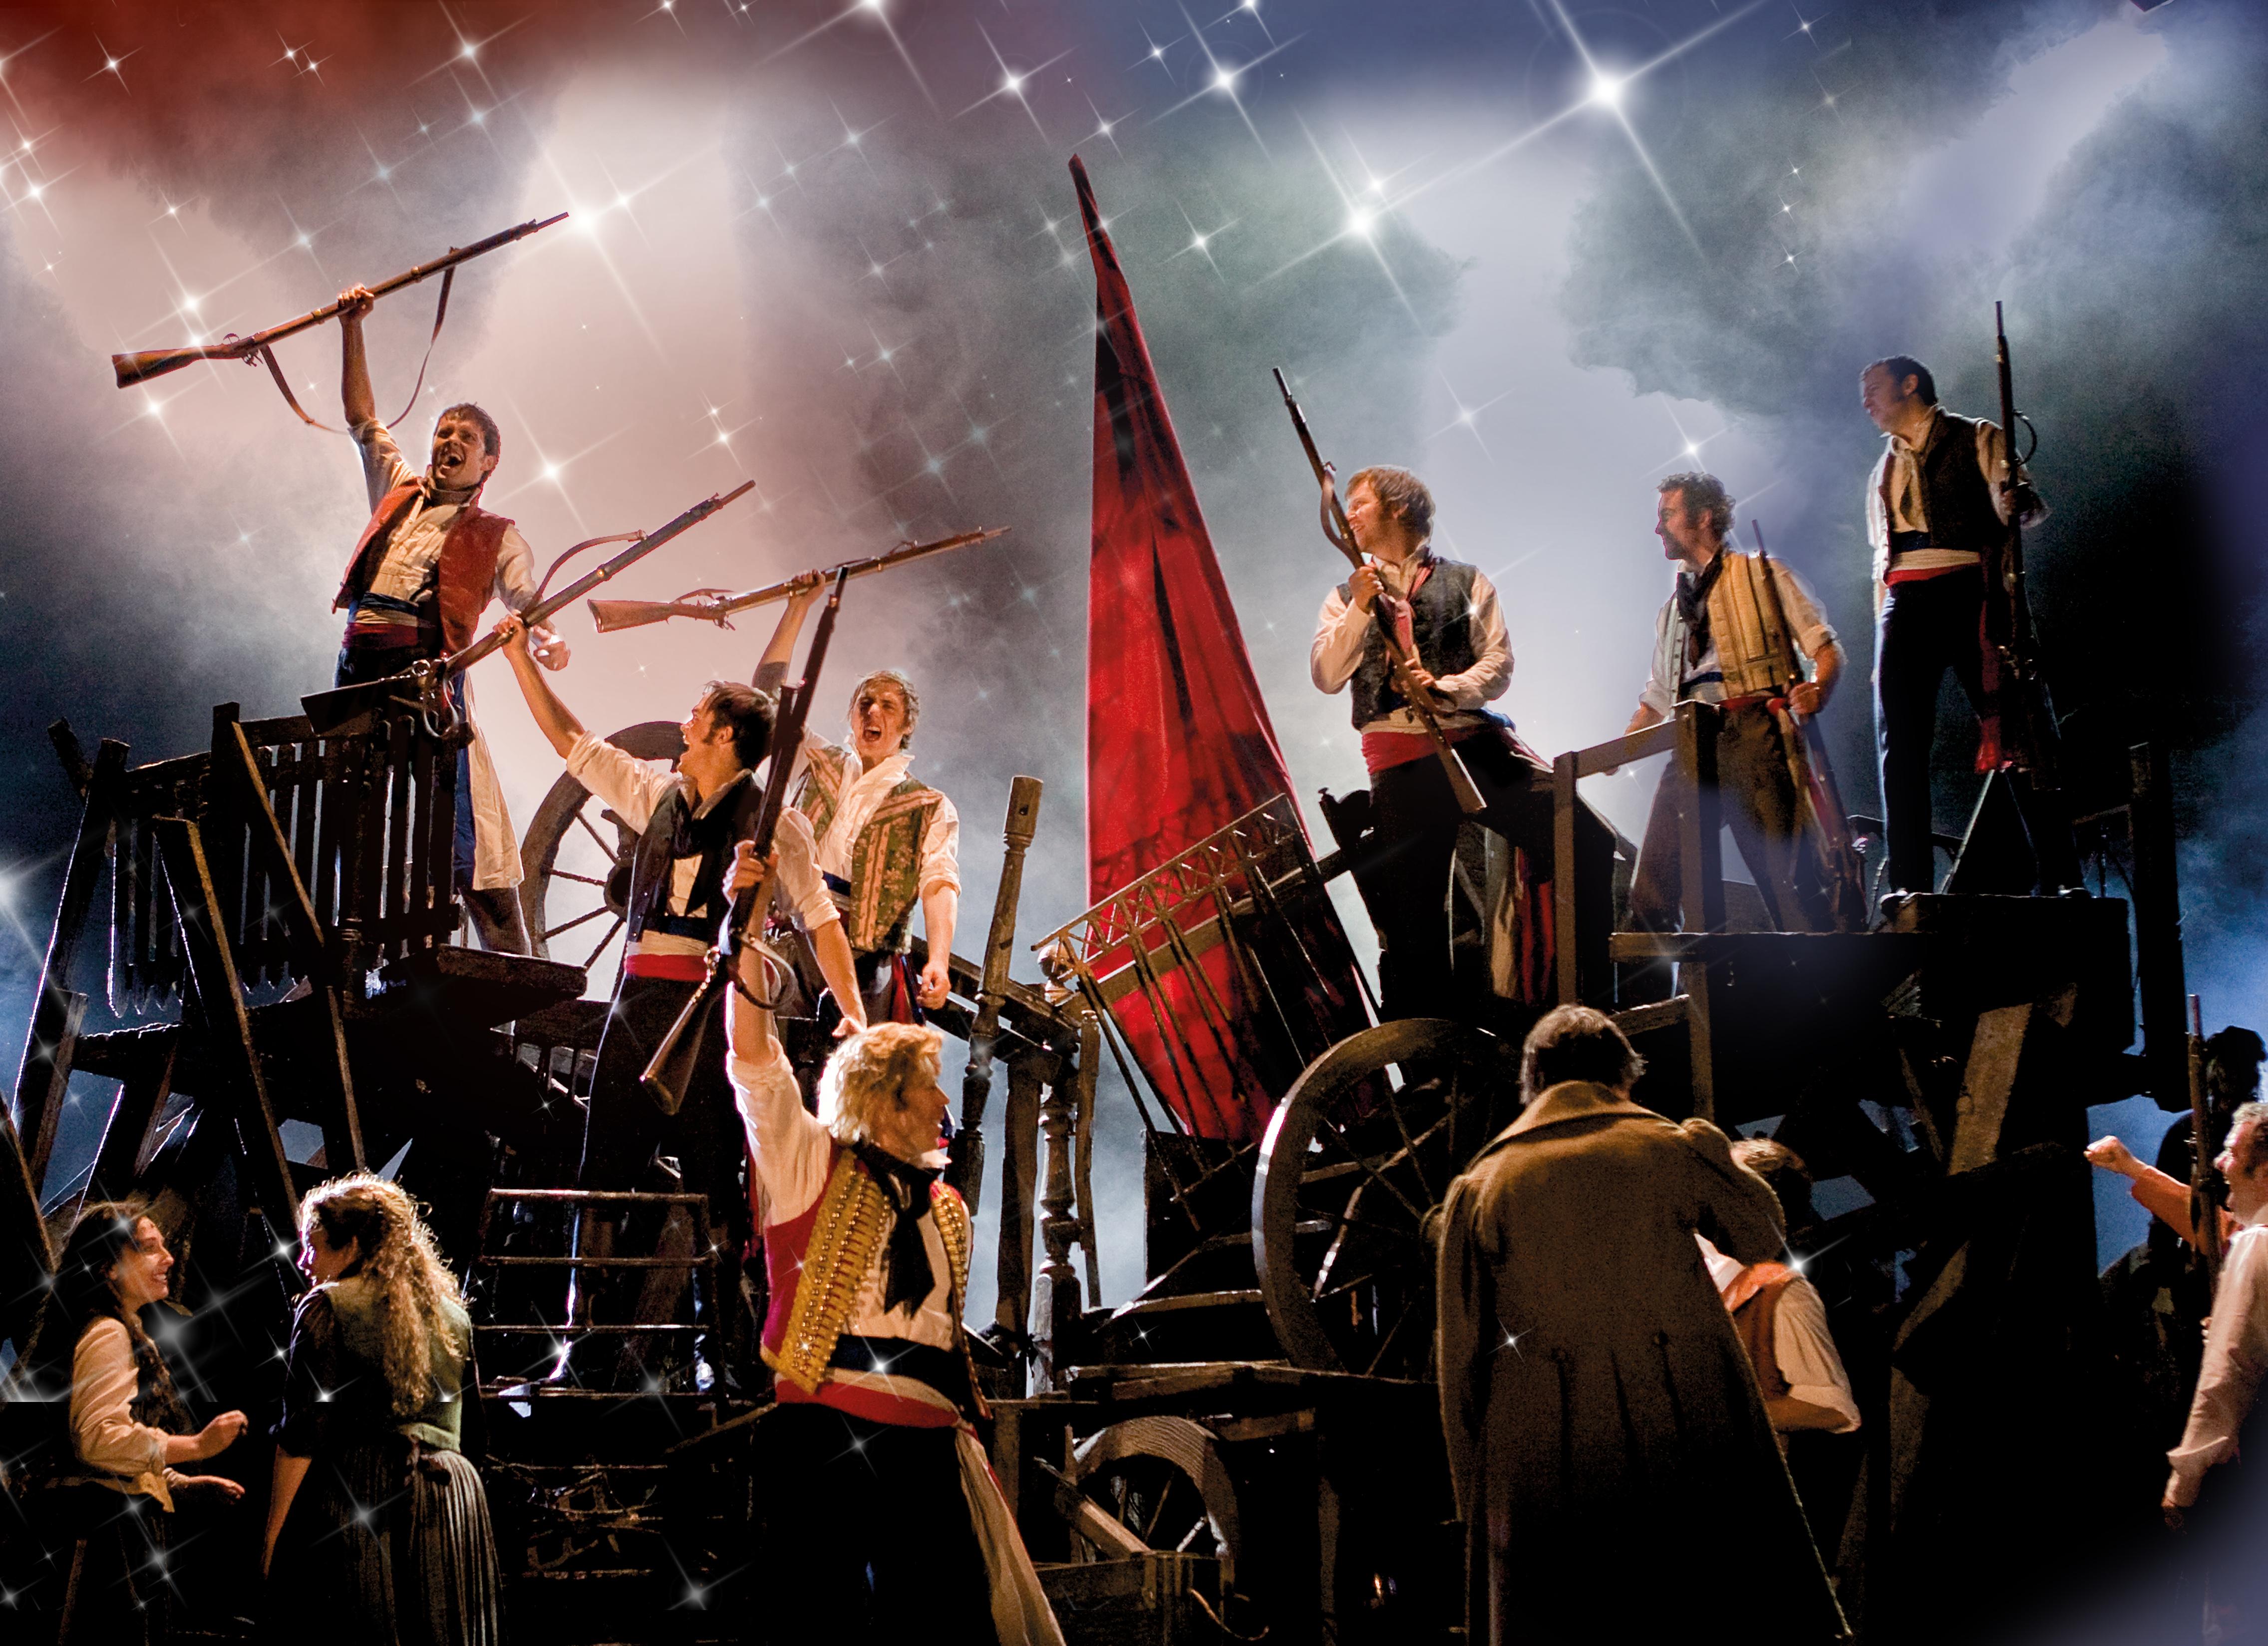 Les Misérables, musical, Roma